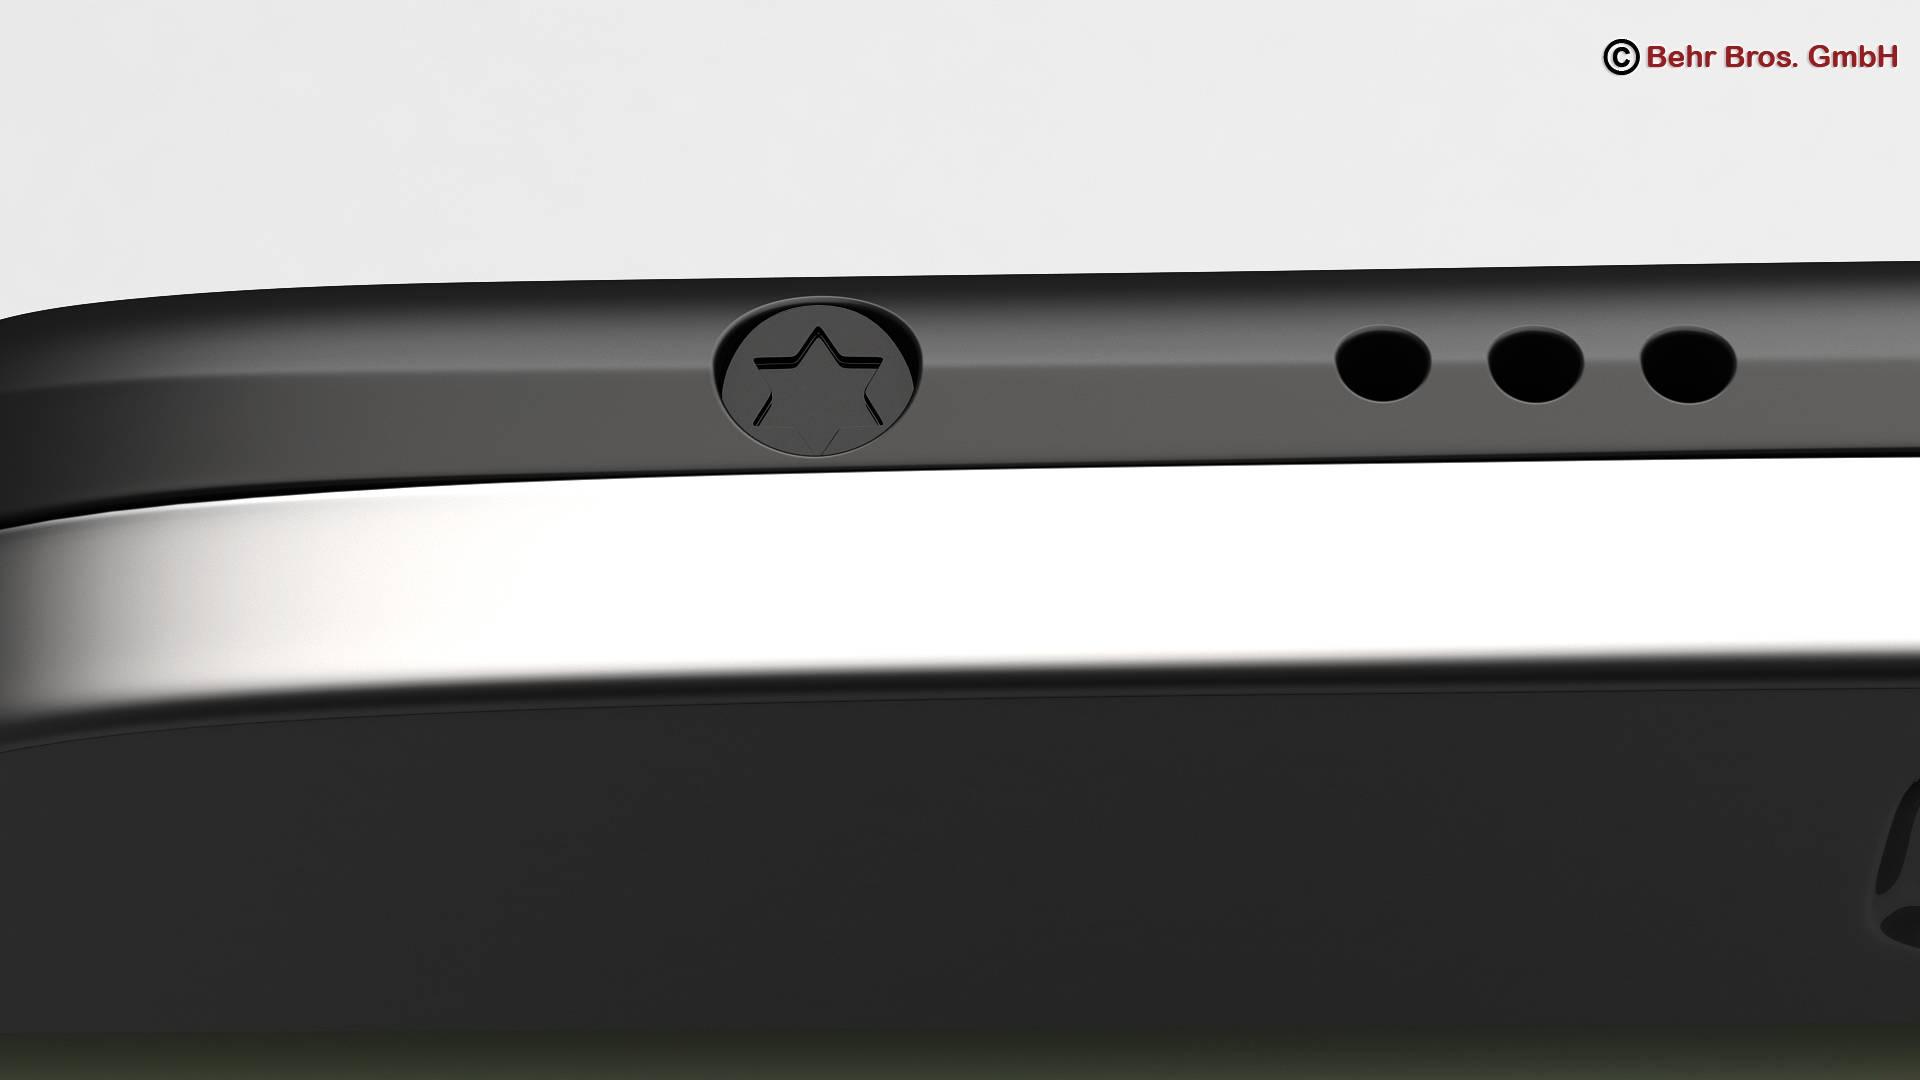 generic smartphone 6 inch 3d model 3ds max fbx c4d lwo ma mb obj 161666